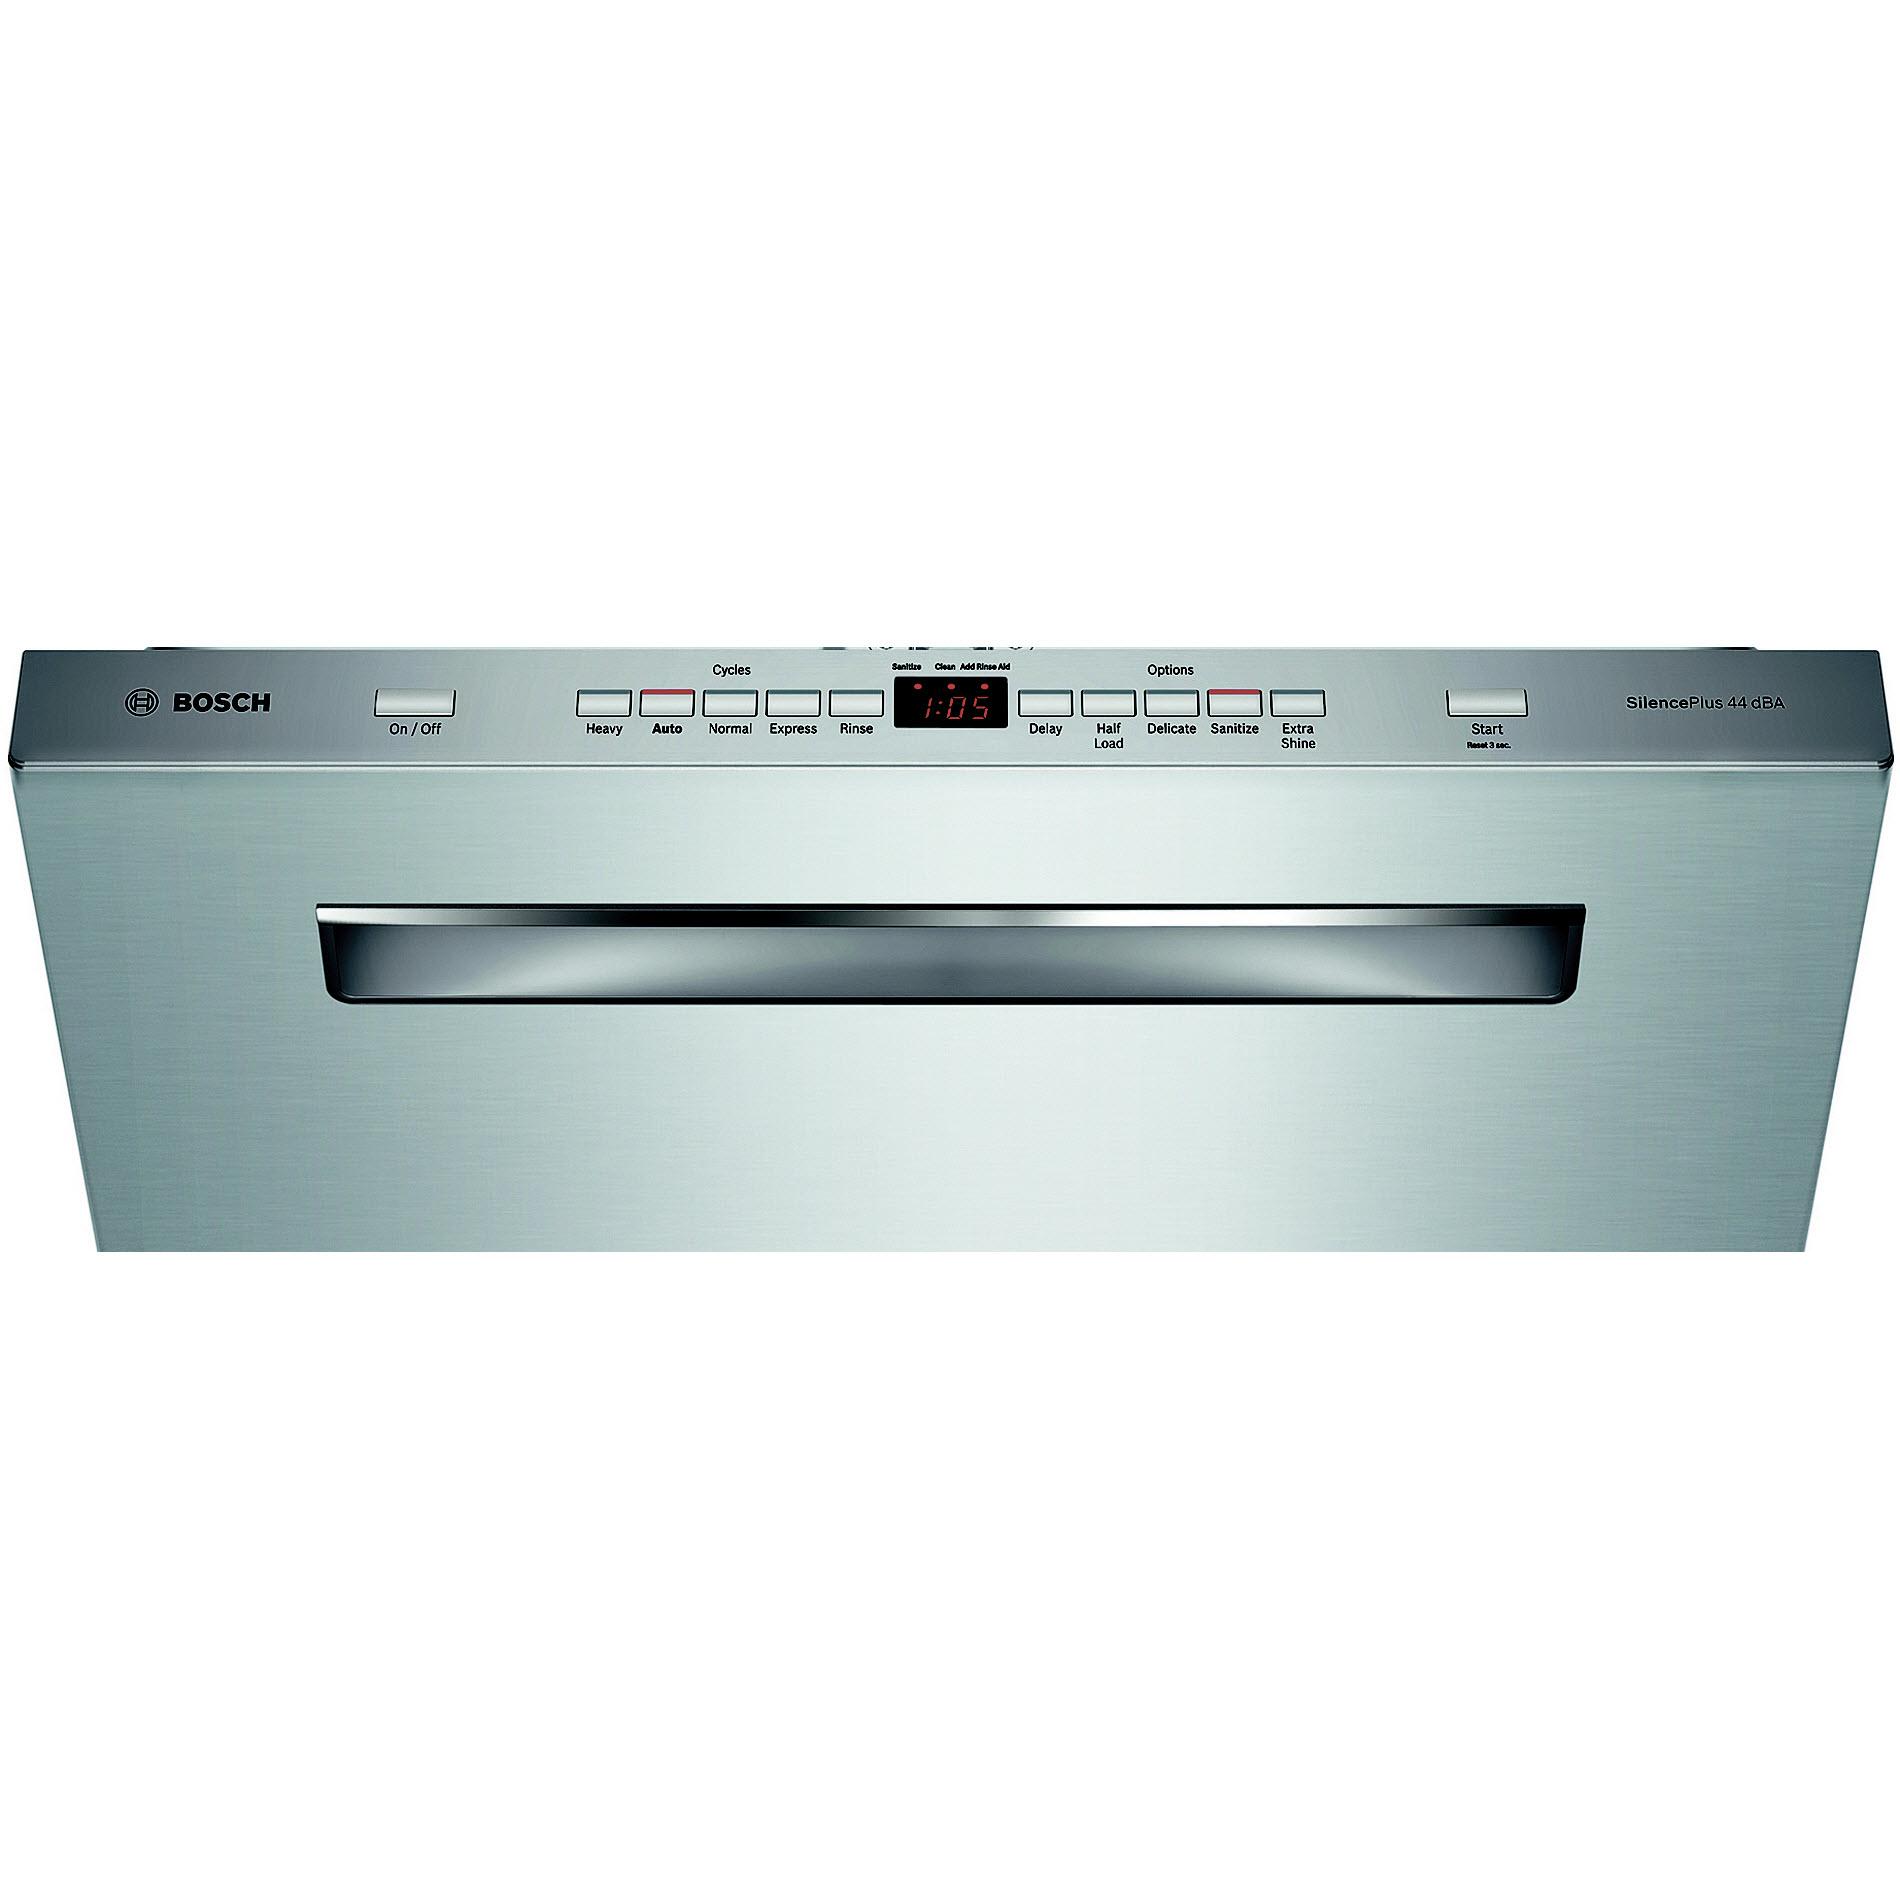 "Bosch 24"" 500 Series Built-In Dishwasher - Stainless Steel"